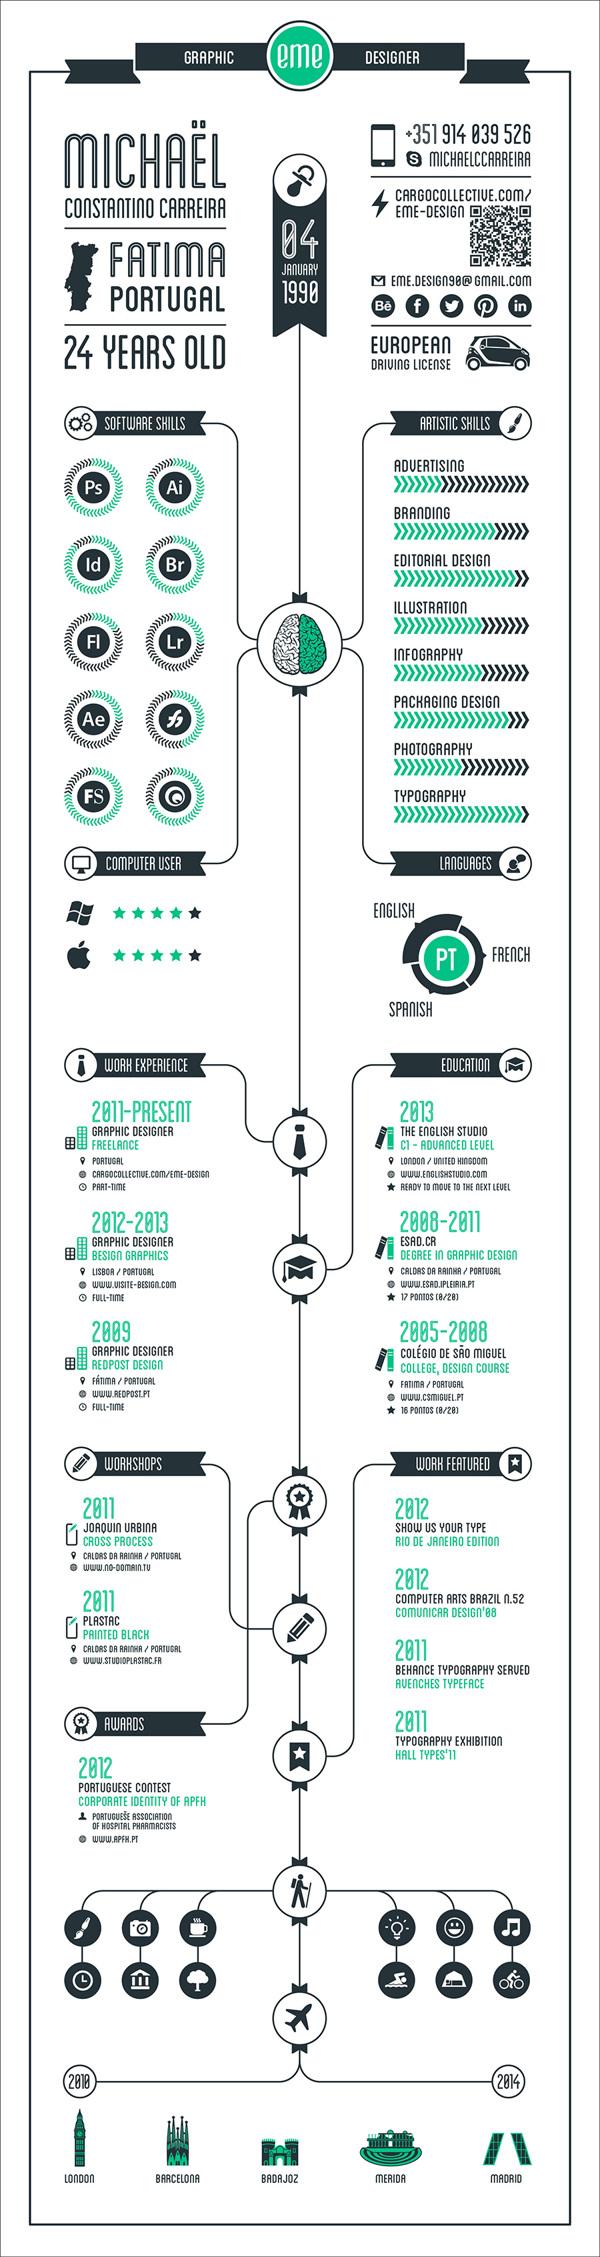 Infographic Cv On Behance Infografik Lebenslauf Bewerbung Design Zeitleiste Design